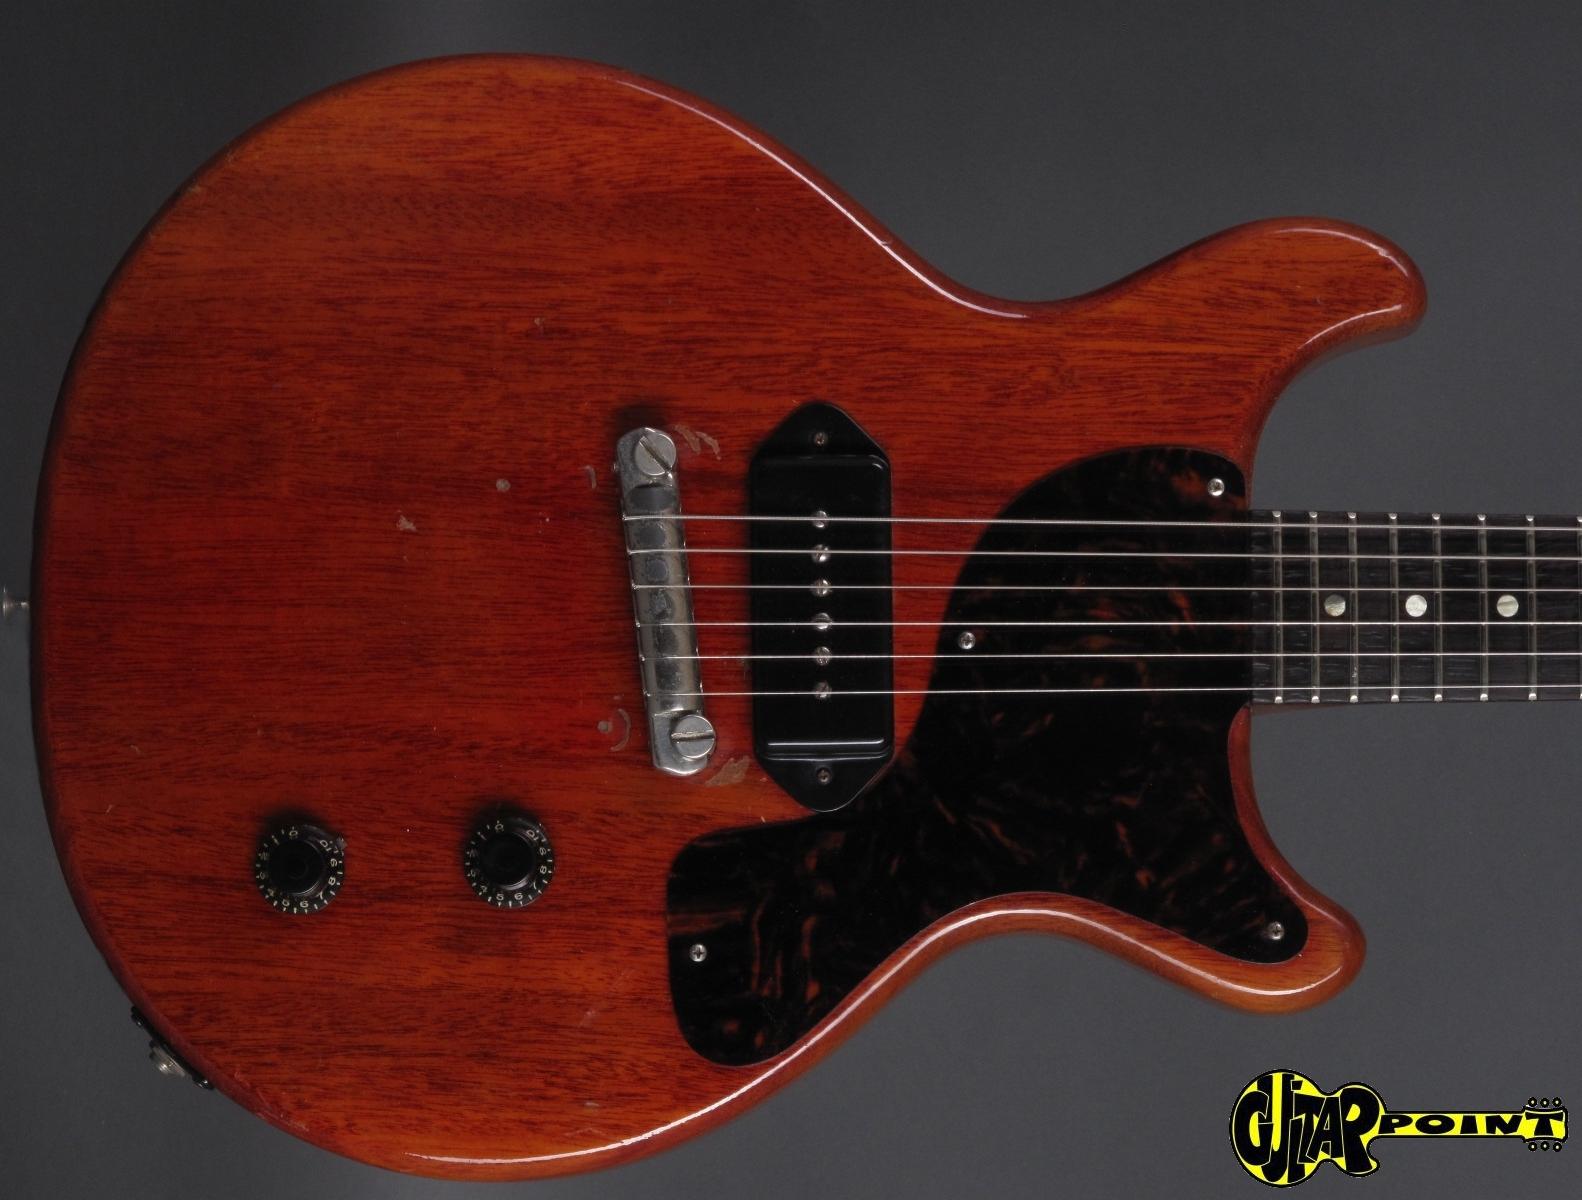 1959 Gibson Les Paul Junior Dc Cherry Vi59gilpjunchdc933801